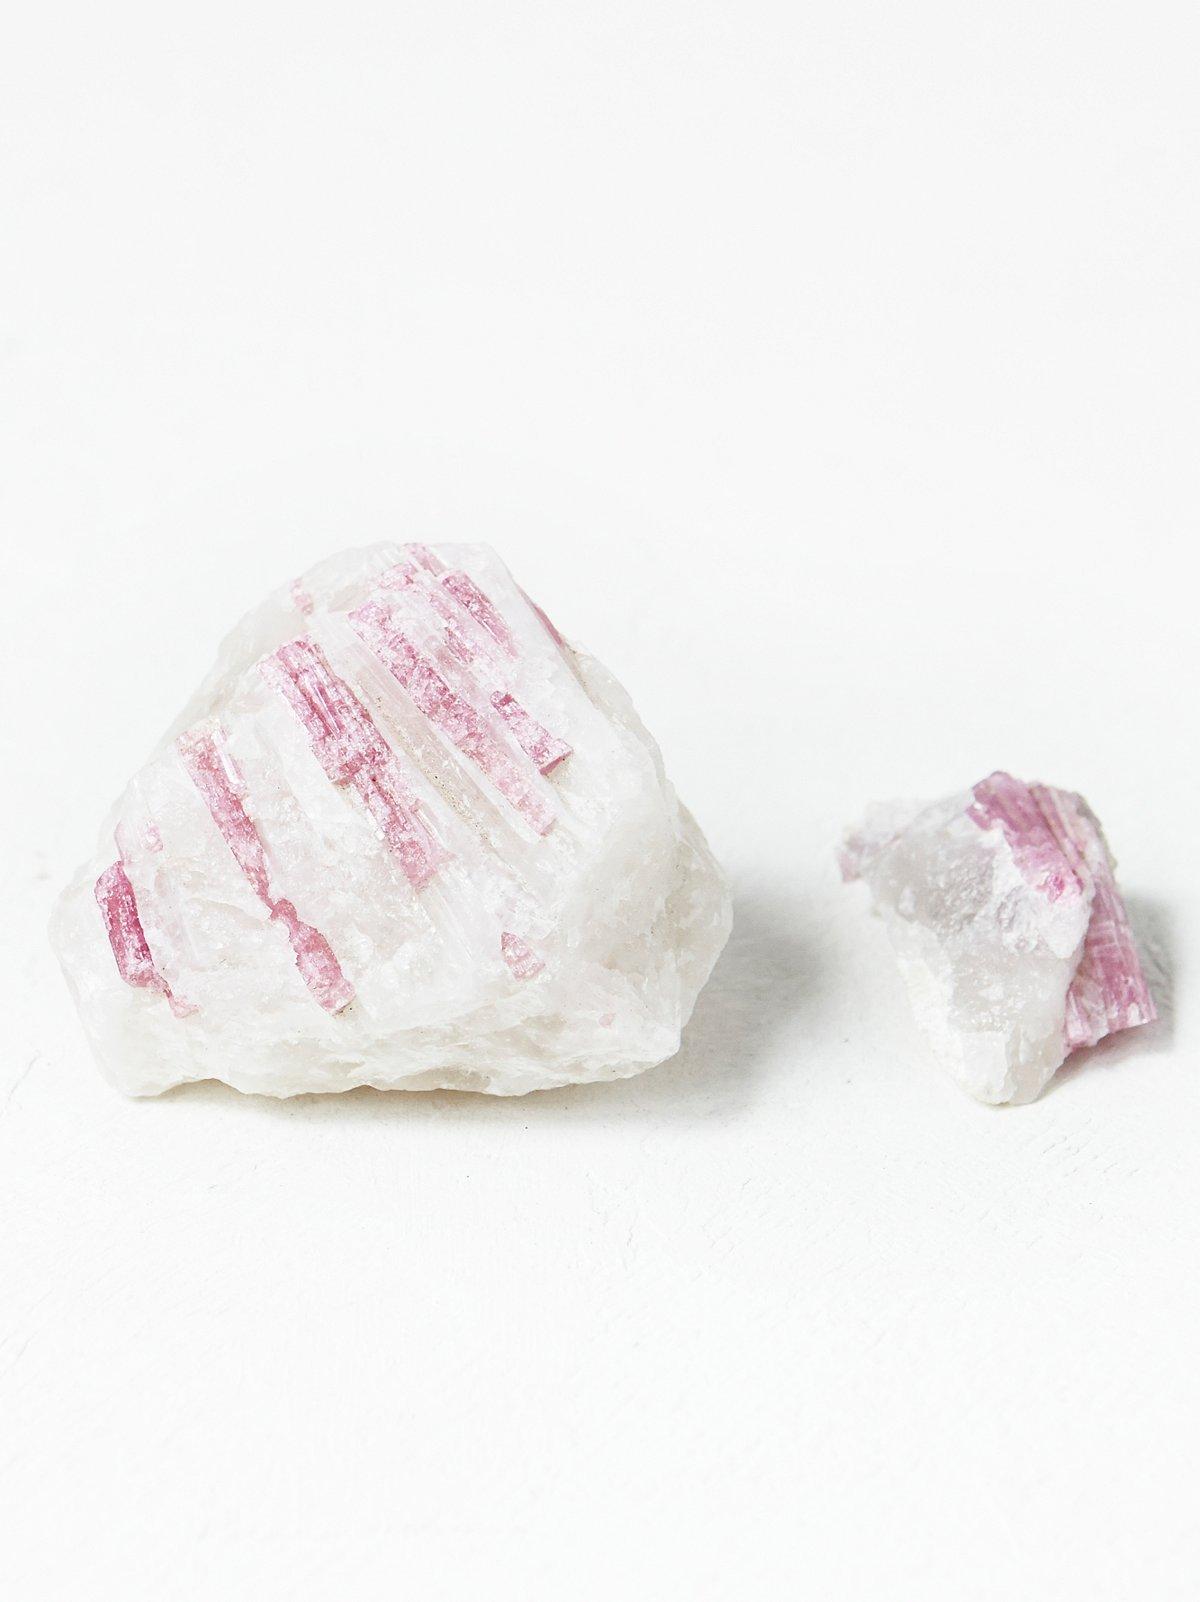 Vintage Red Tourmaline Crystal